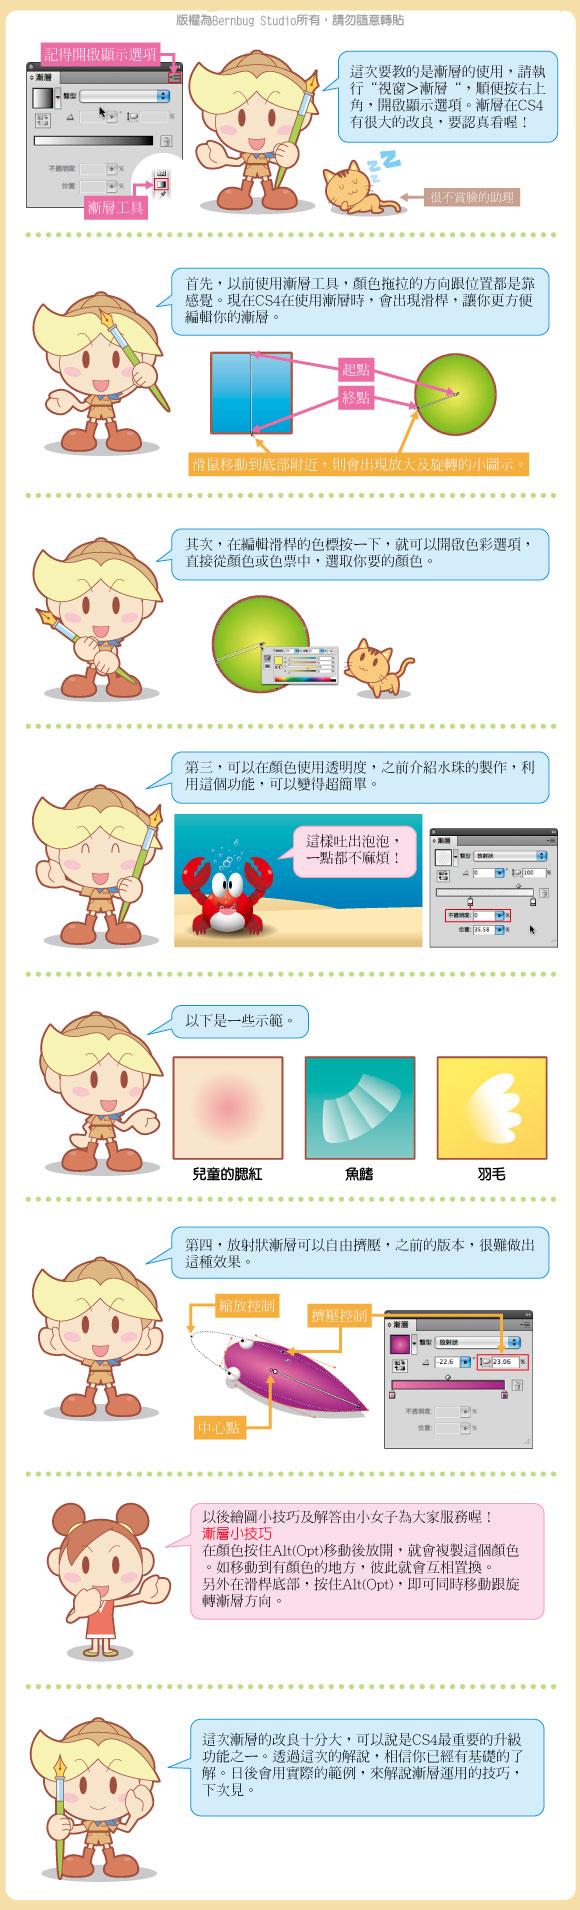 lesson2.jpg